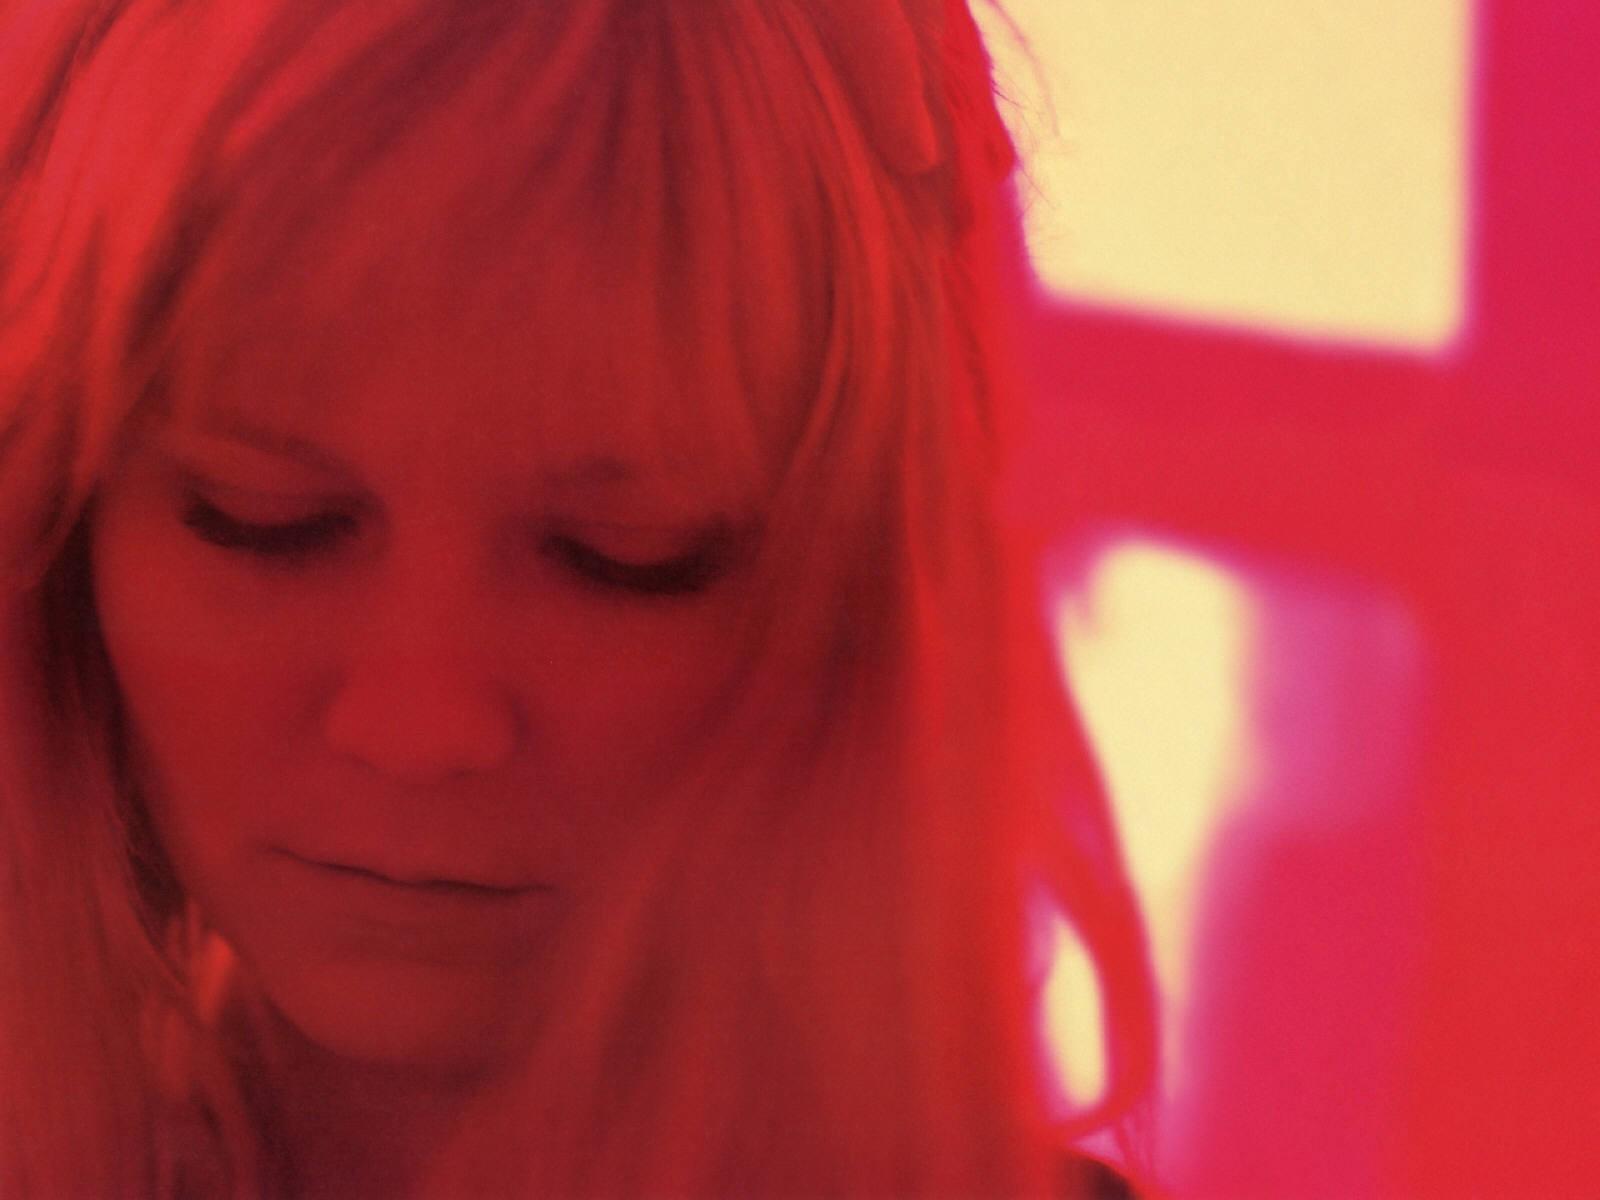 Wallpaper di Kirsten Dunst in rosso